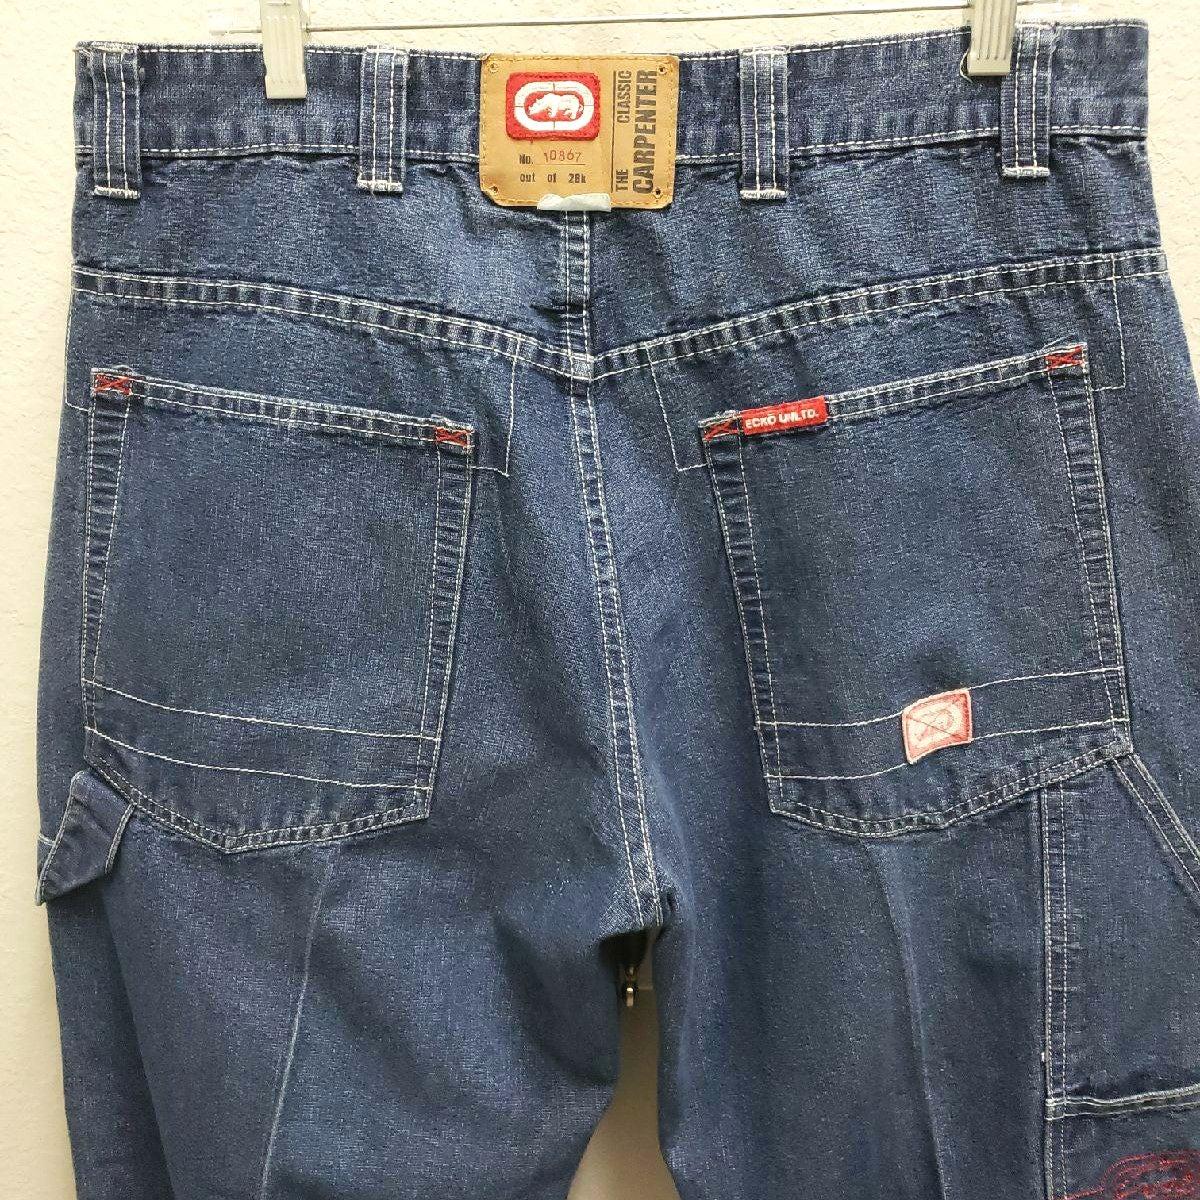 Marc Ecko Limit Edition Sz 34 Denim Jean